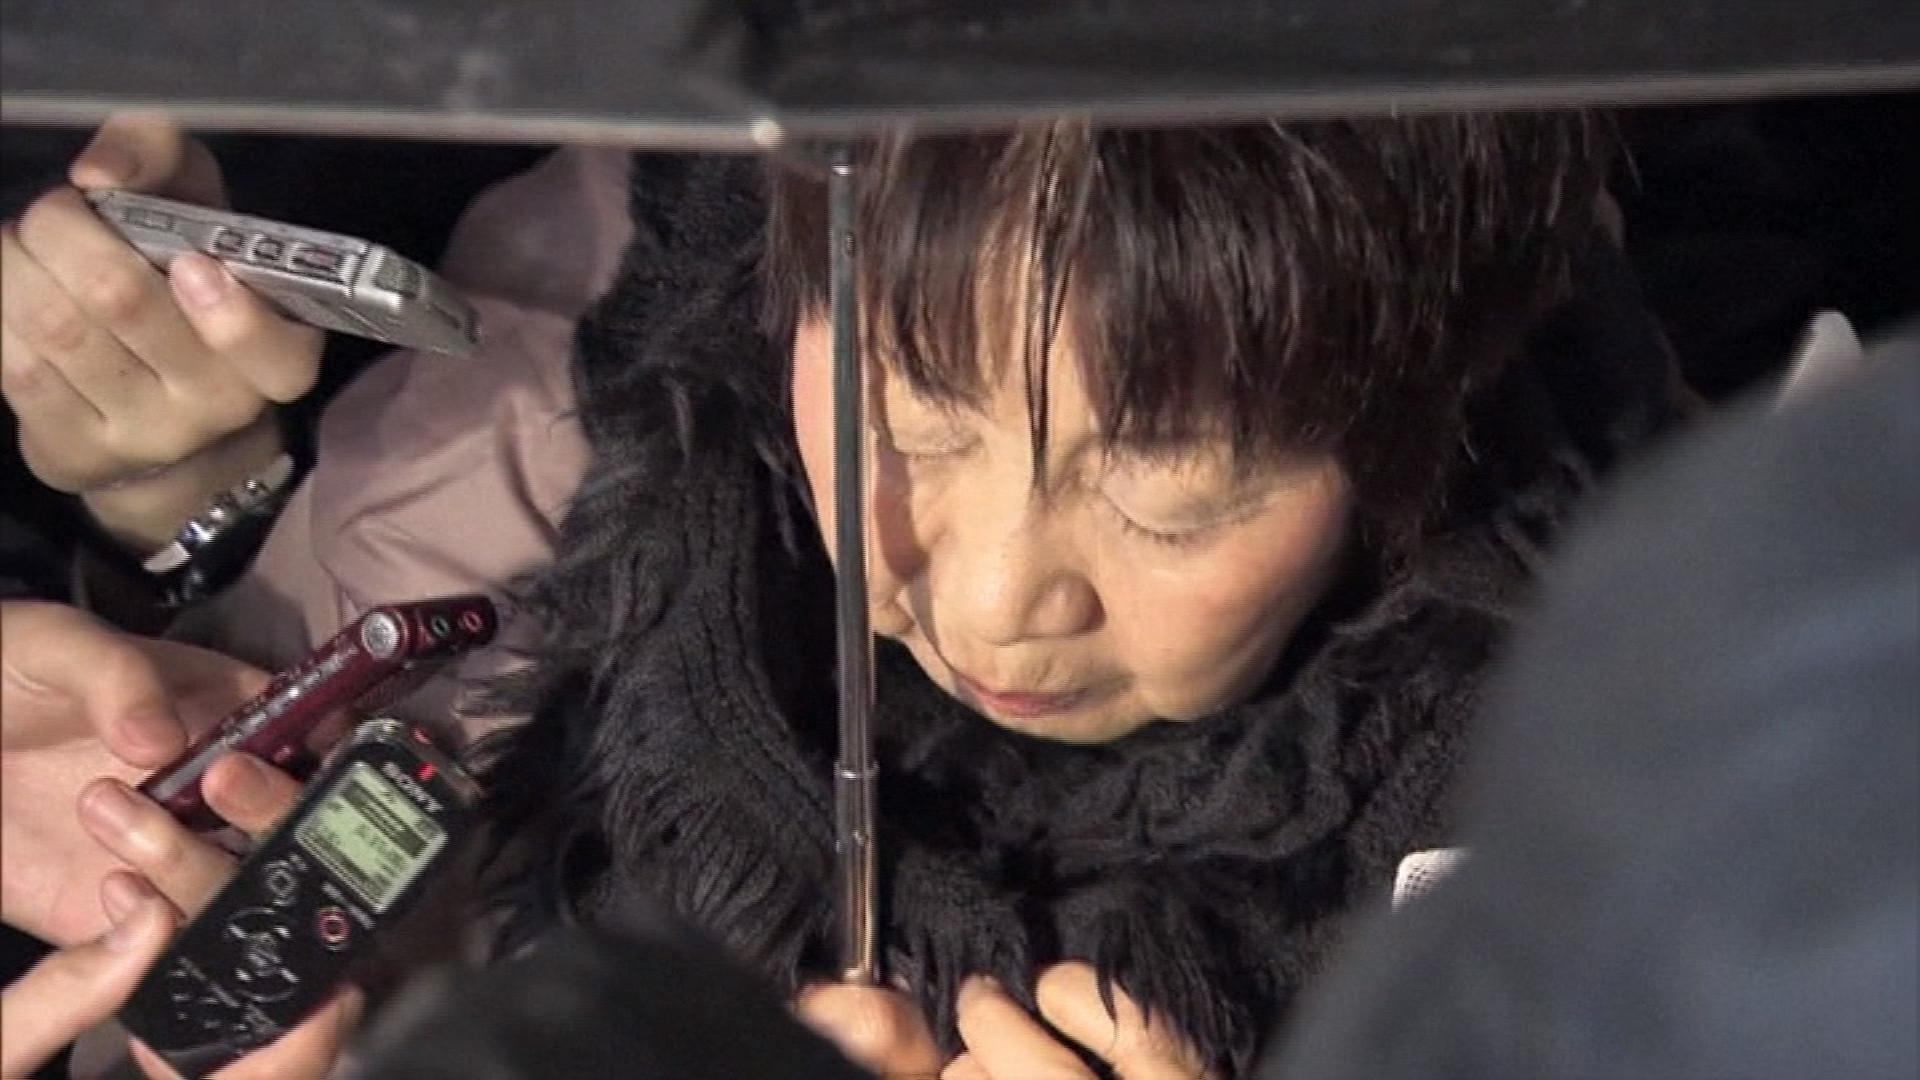 Japan police and ebony fuck suspect was 9